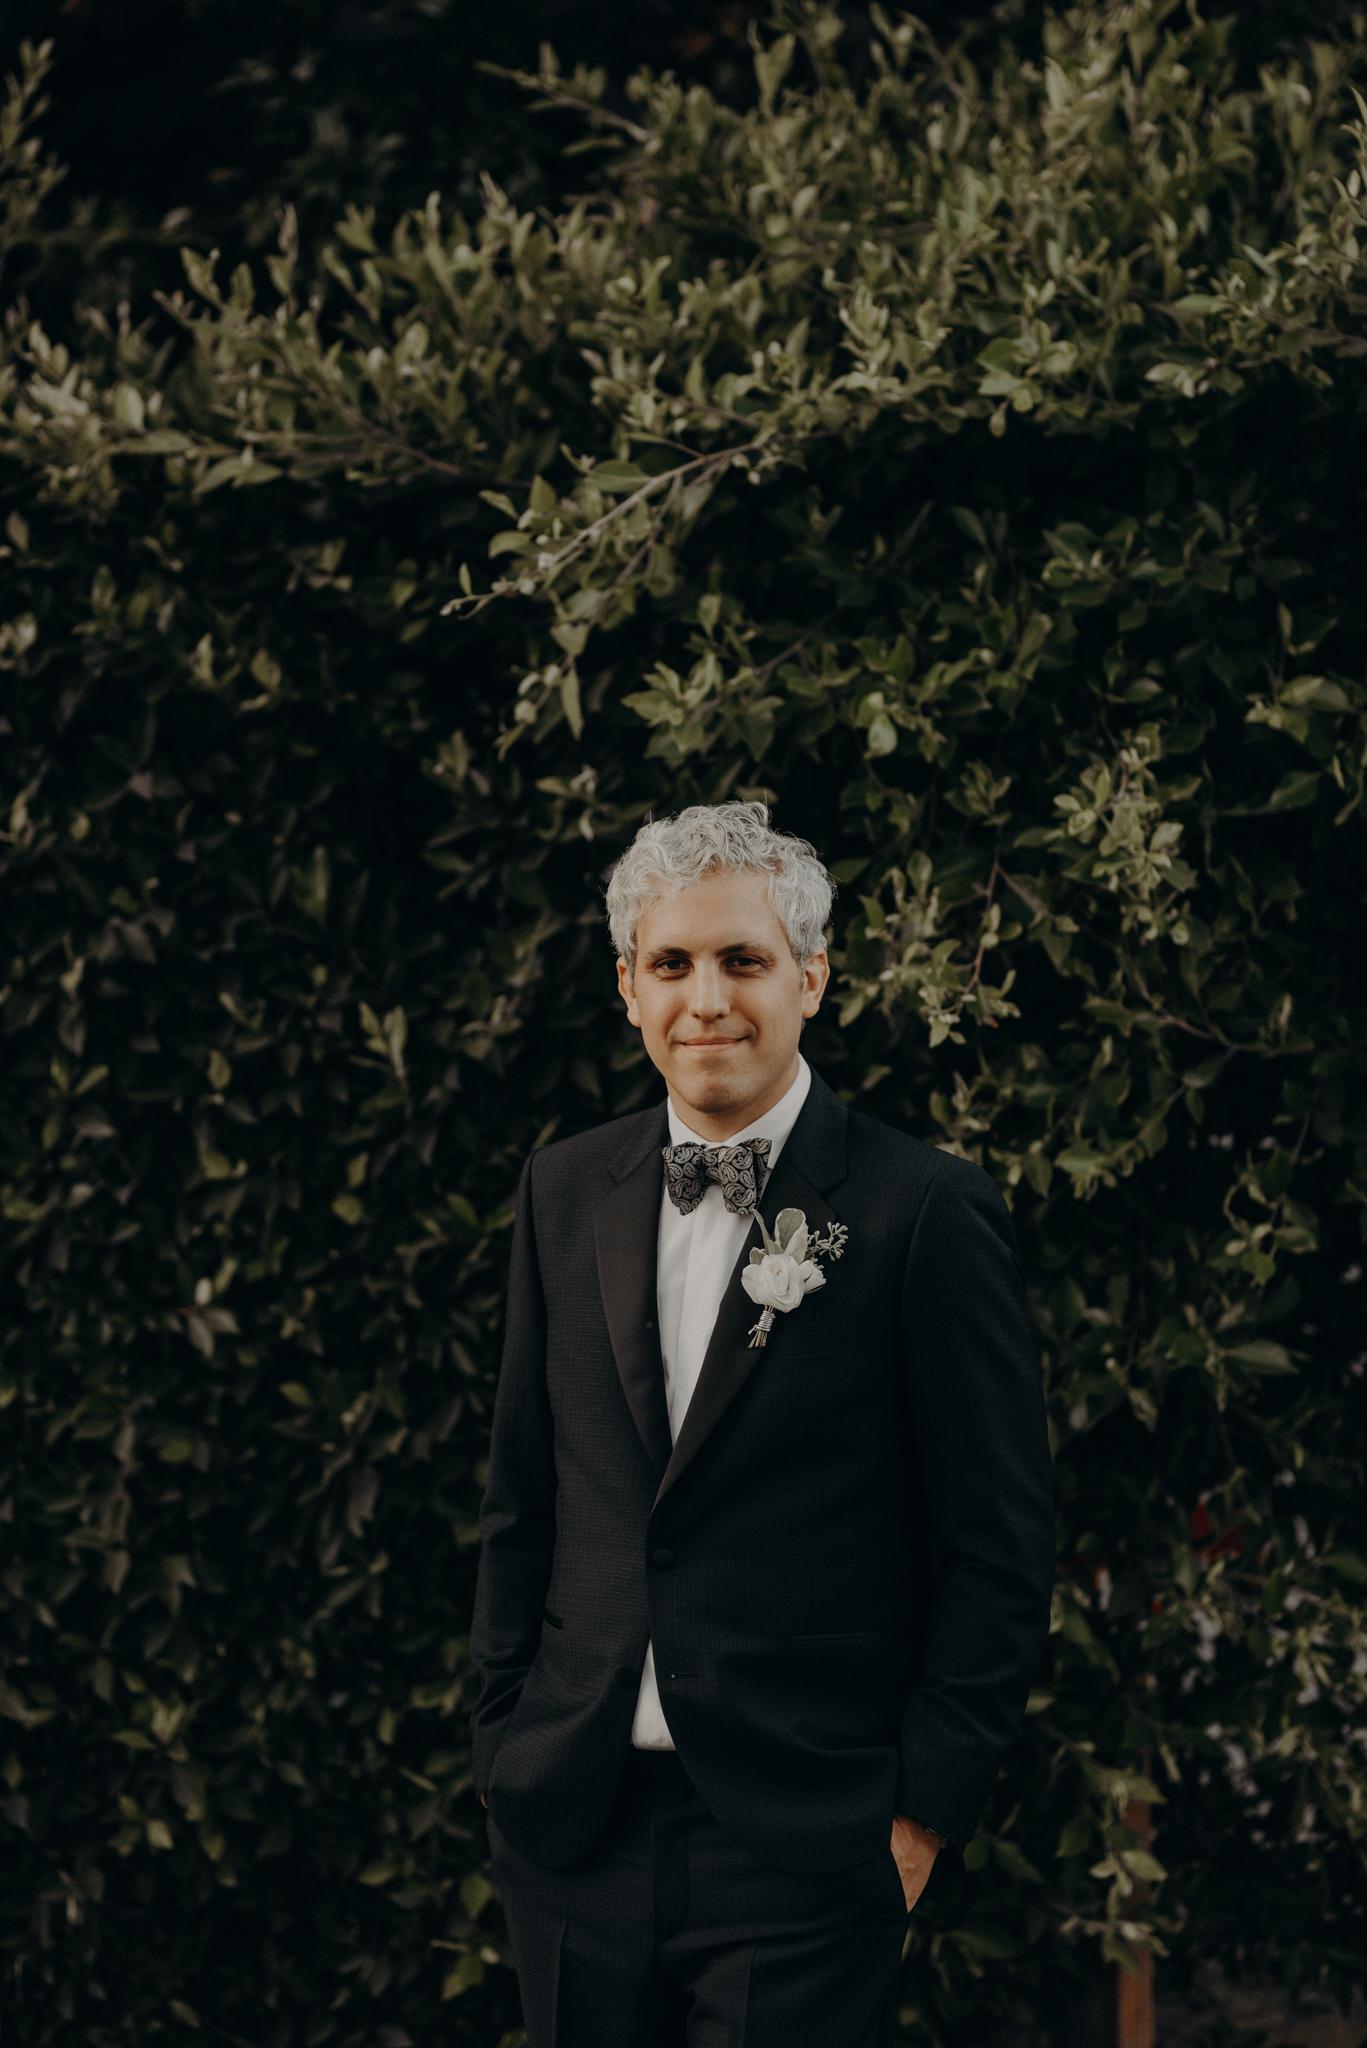 Isaiah + Taylor Photography - Private Estate Backyard Wedding - Beverly Hills - Los Angeles Wedding Photographer - 121.jpg